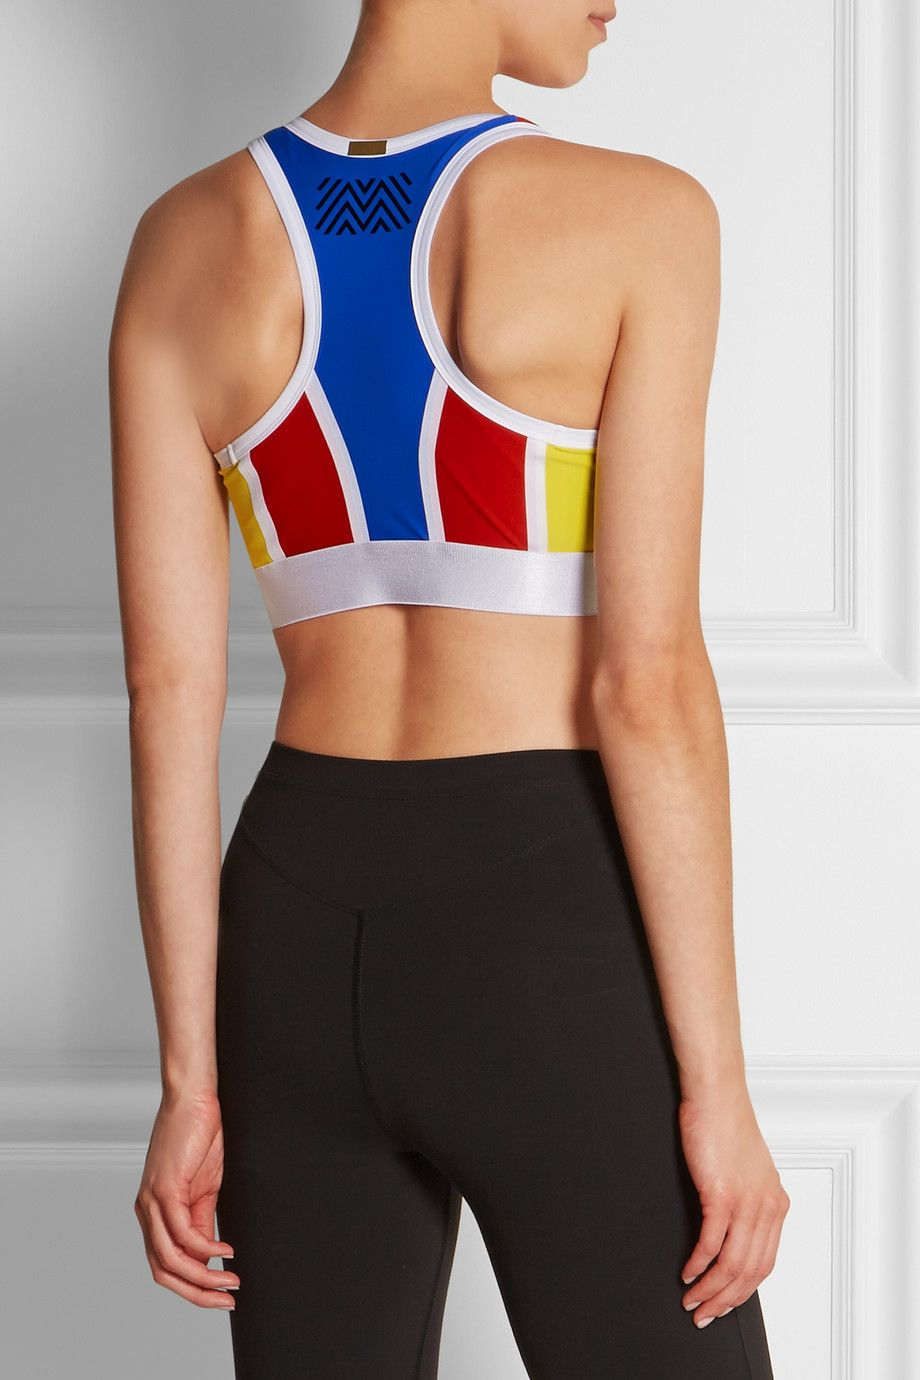 Monreal London Colorblock stretch sports bra NETA